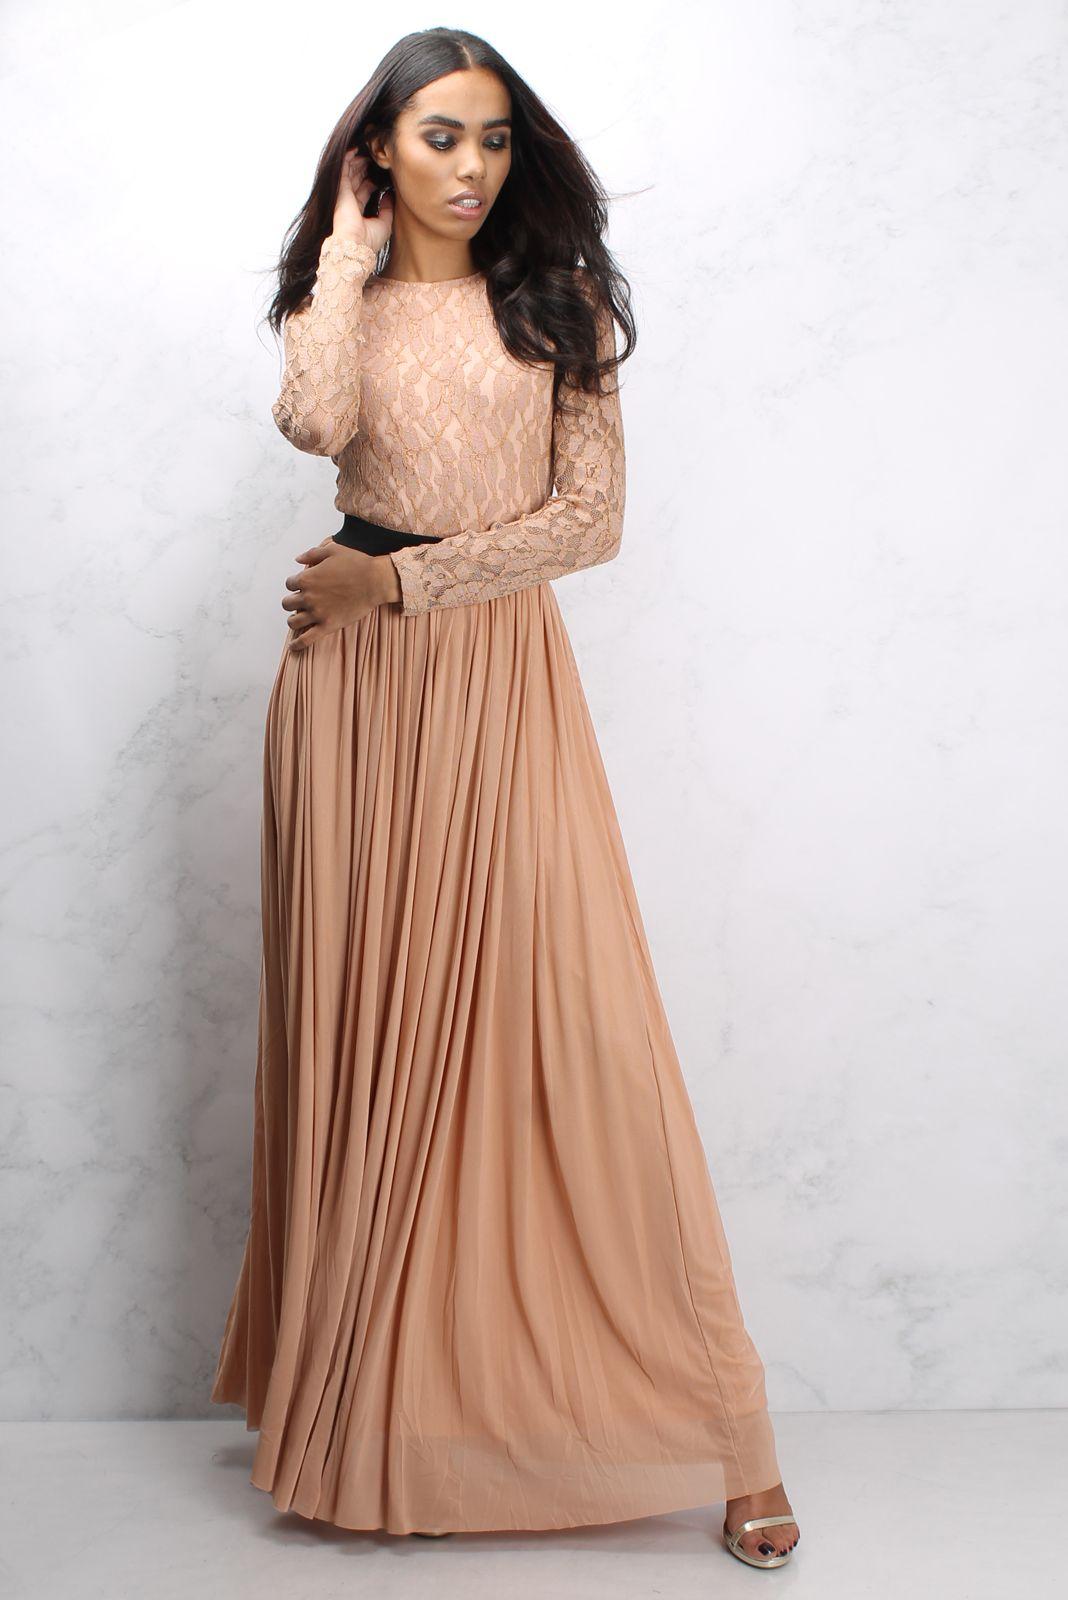 Maxi dress rims my best dresses pinterest maxis dresses